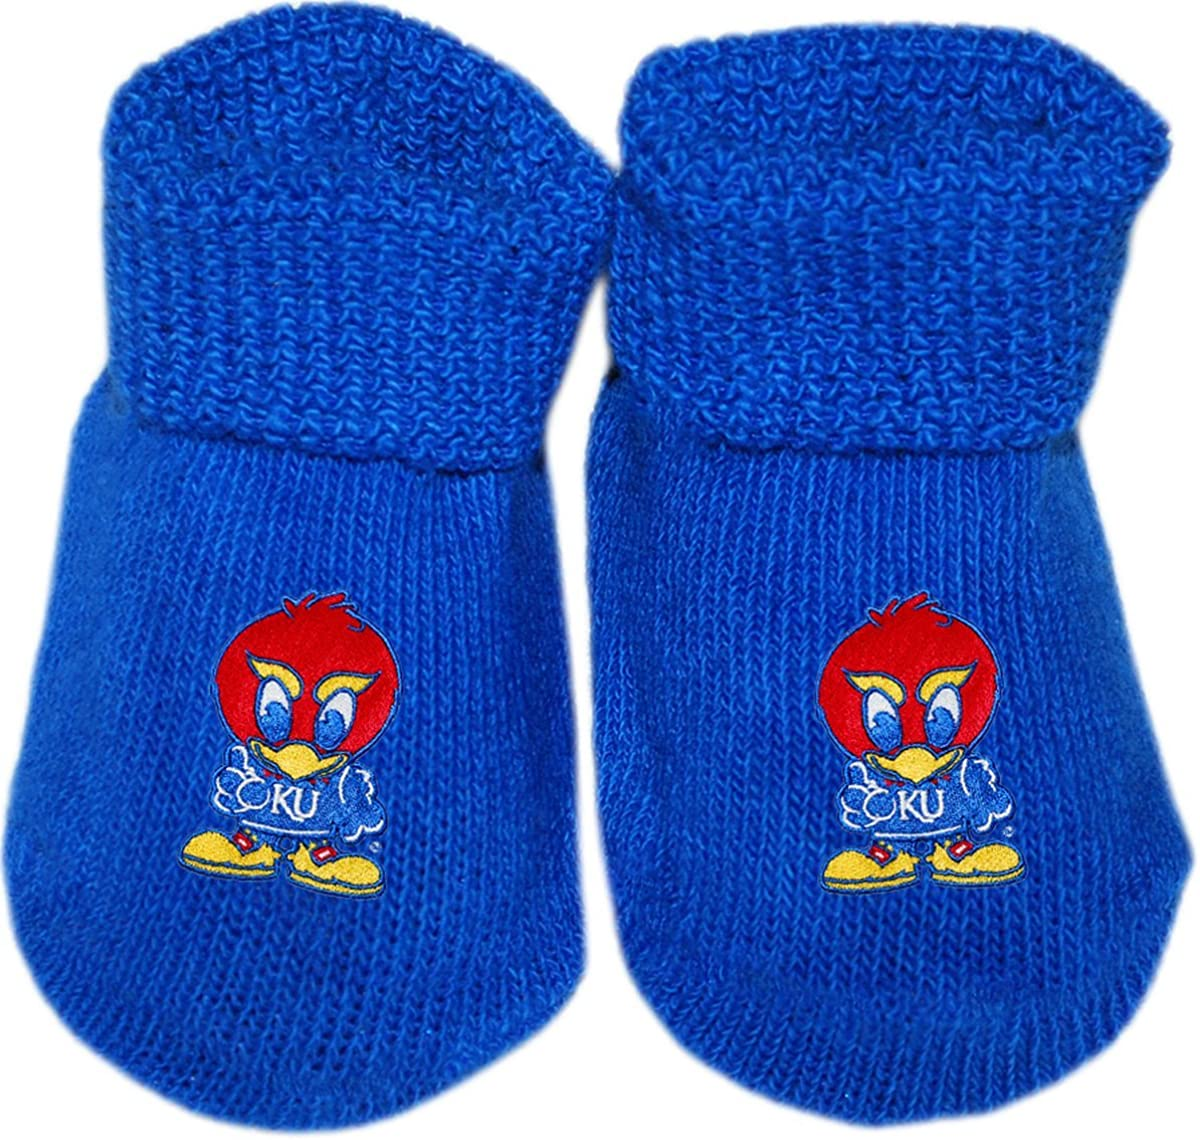 University of Kansas Youth Jay Hawk Newborn Baby Bootie Sock